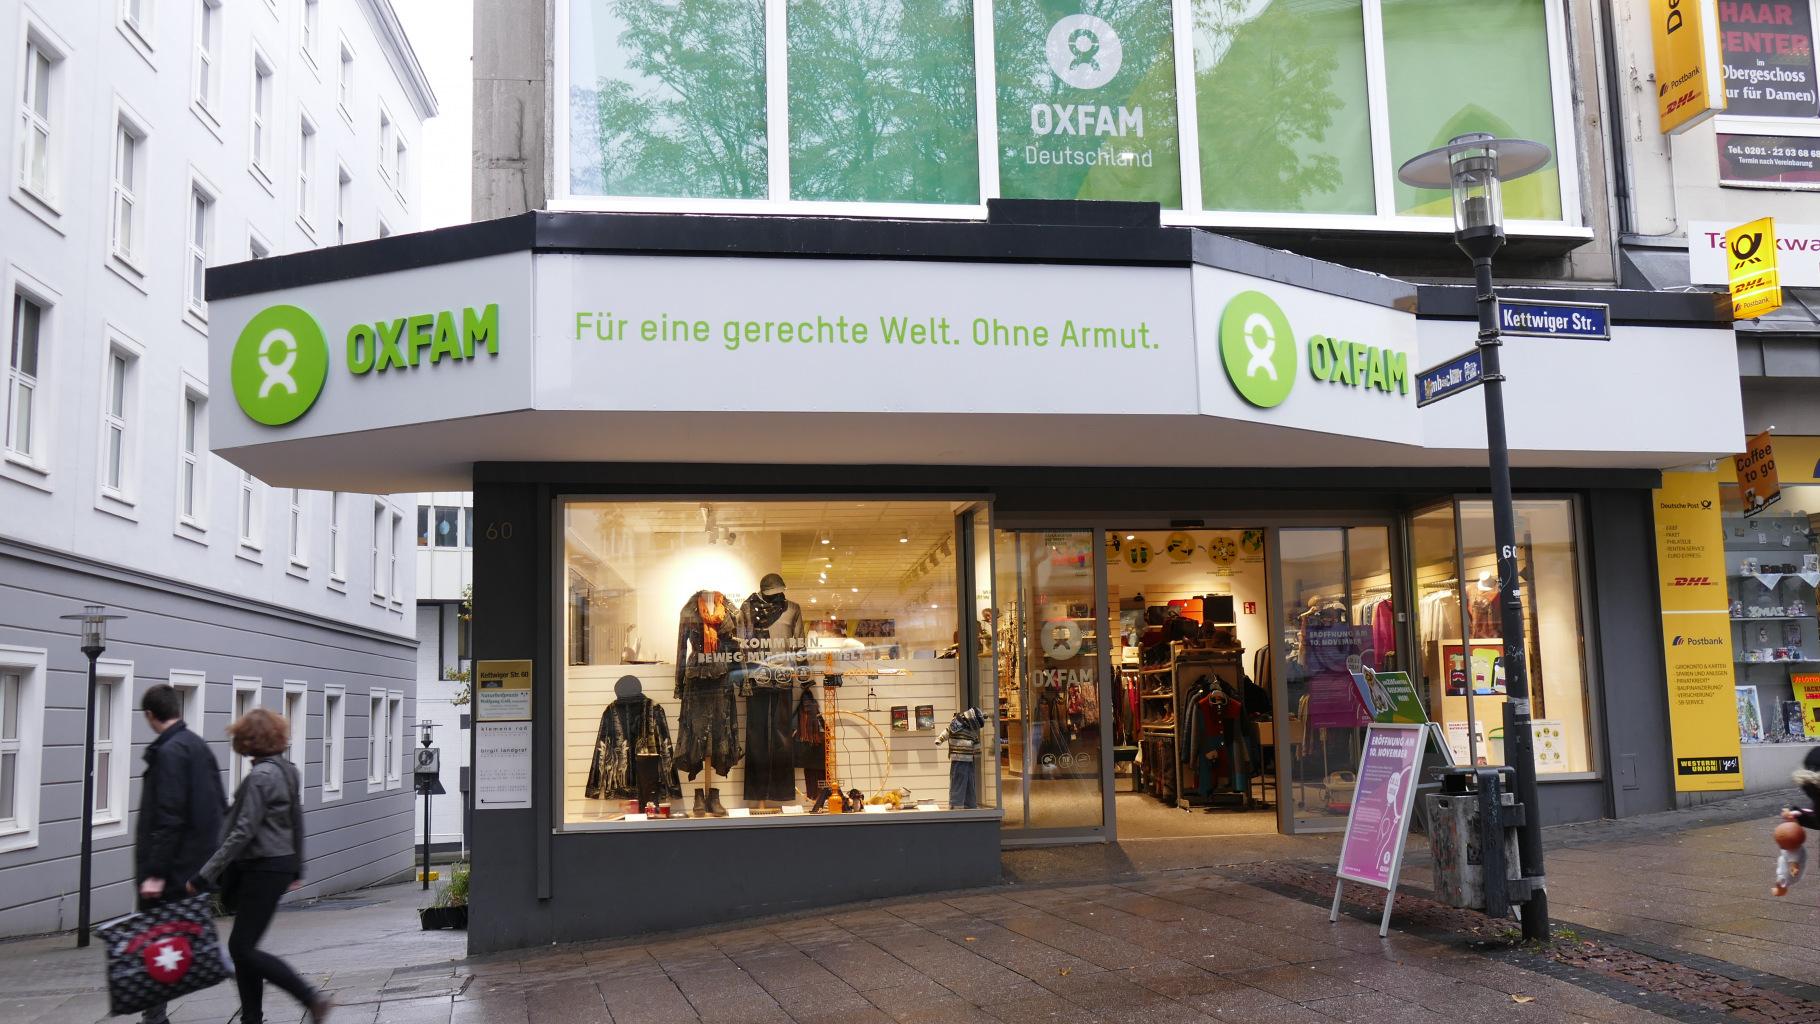 Oxfam Shop Essen